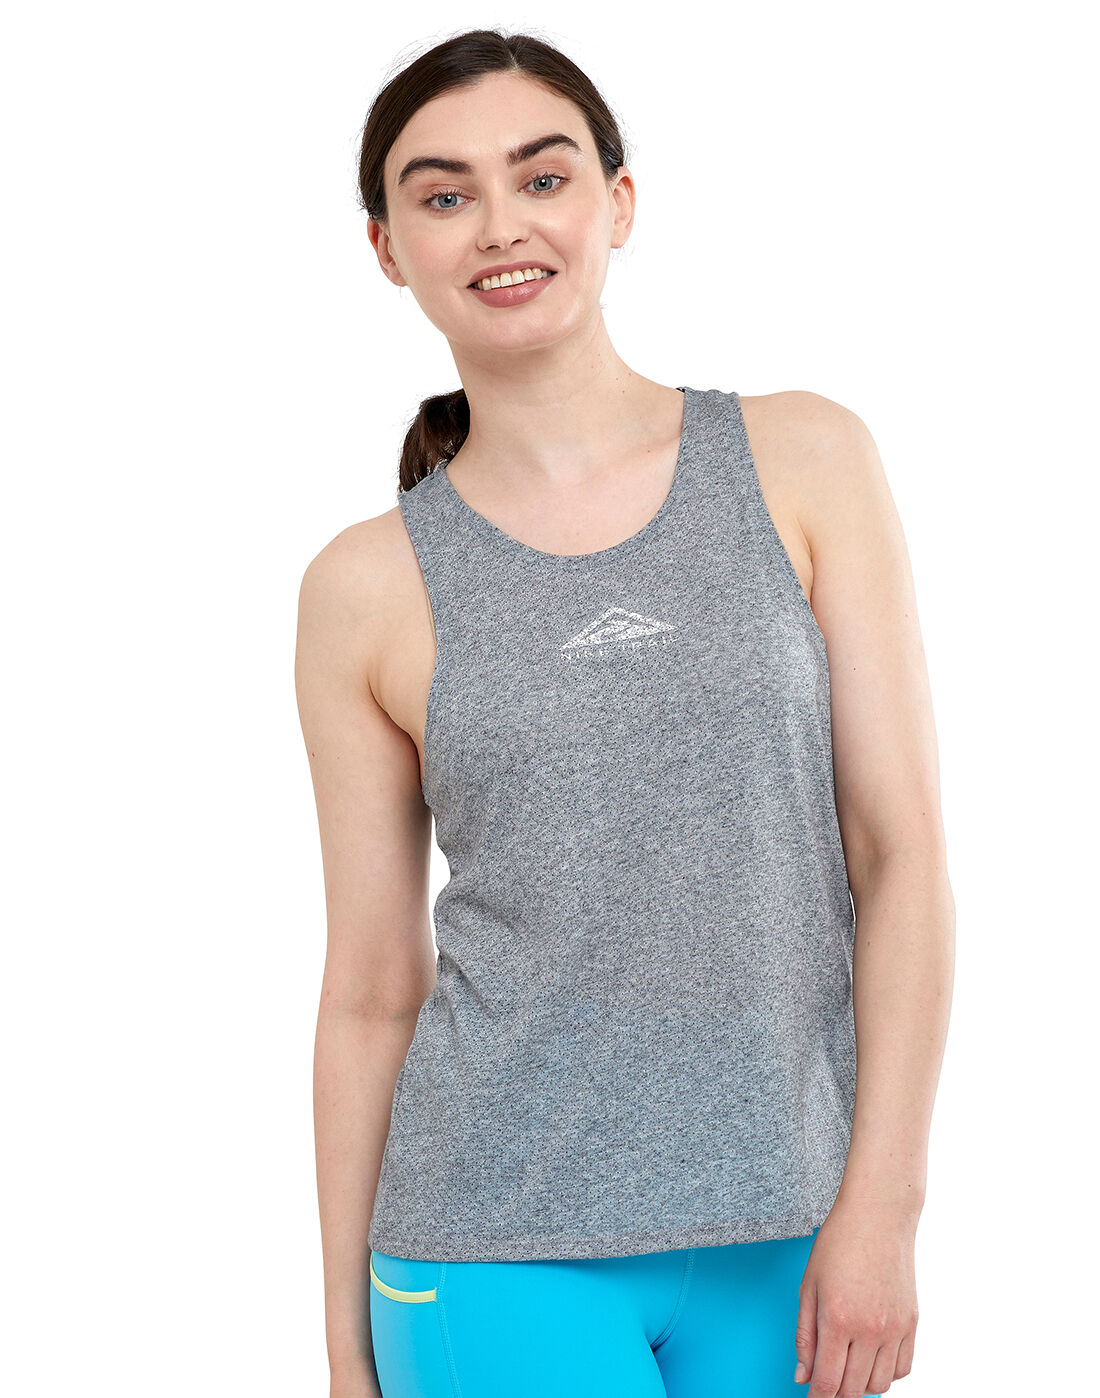 Nike Womens Trail Sleek Tank Top - Grey   adidas gazelle bleu ...